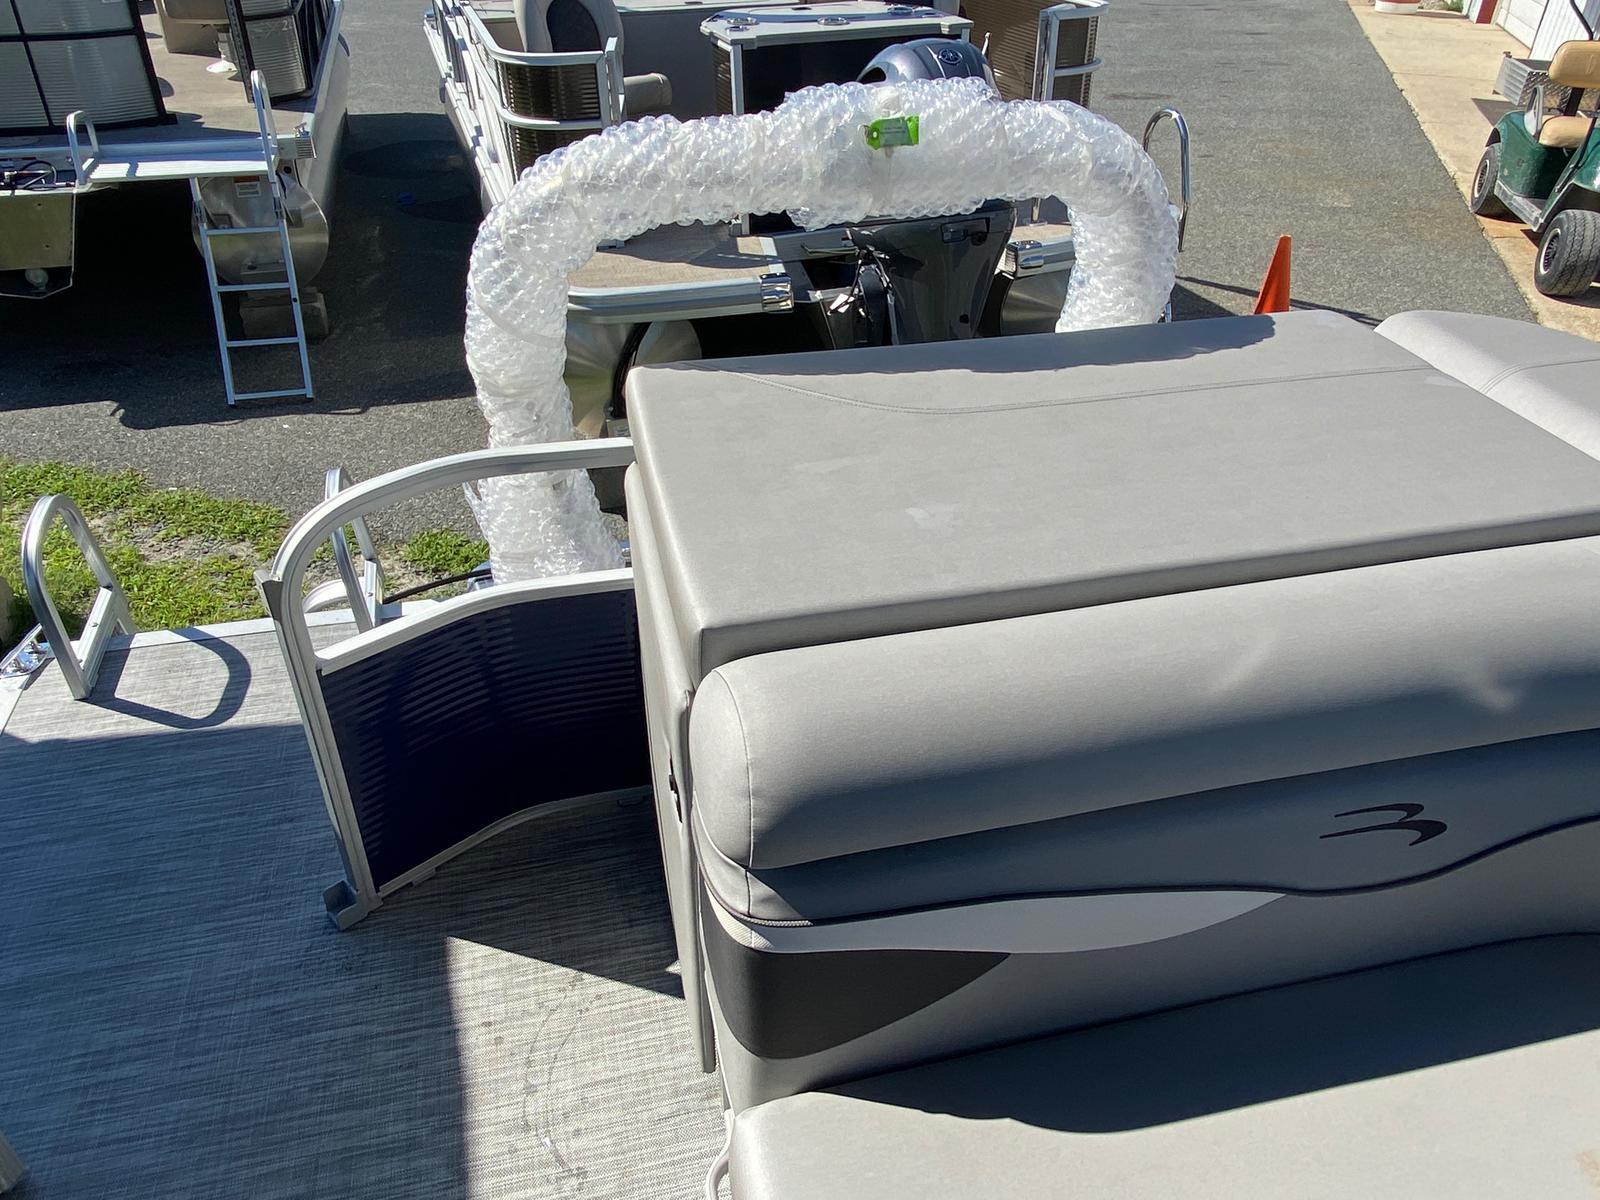 2021 Bennington boat for sale, model of the boat is 20 SVL & Image # 6 of 9